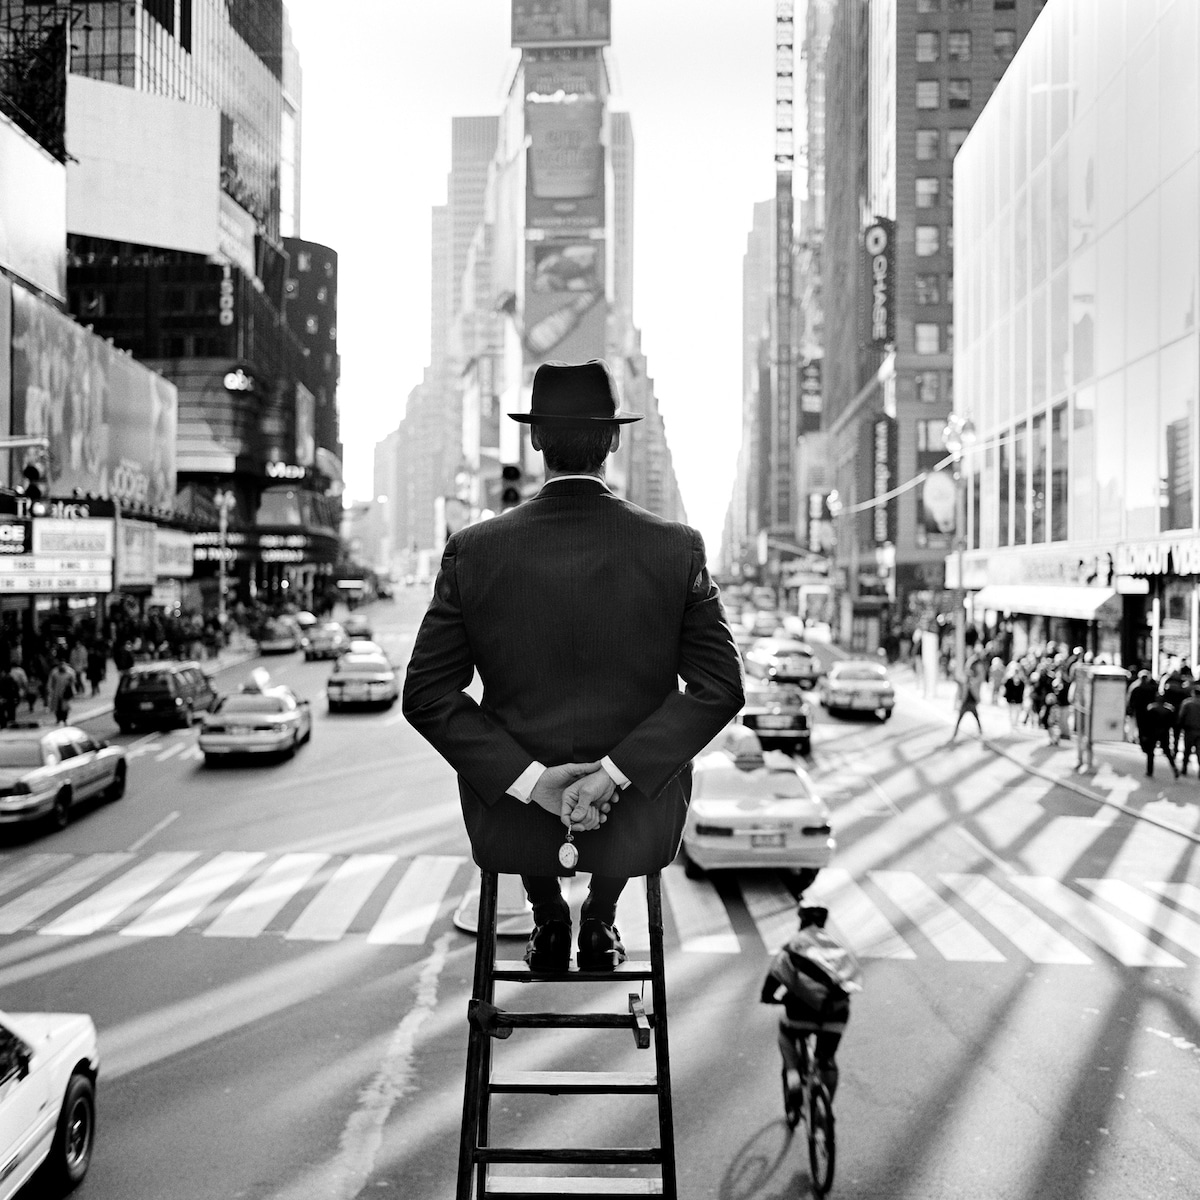 Rodney Smith Black and White Photography